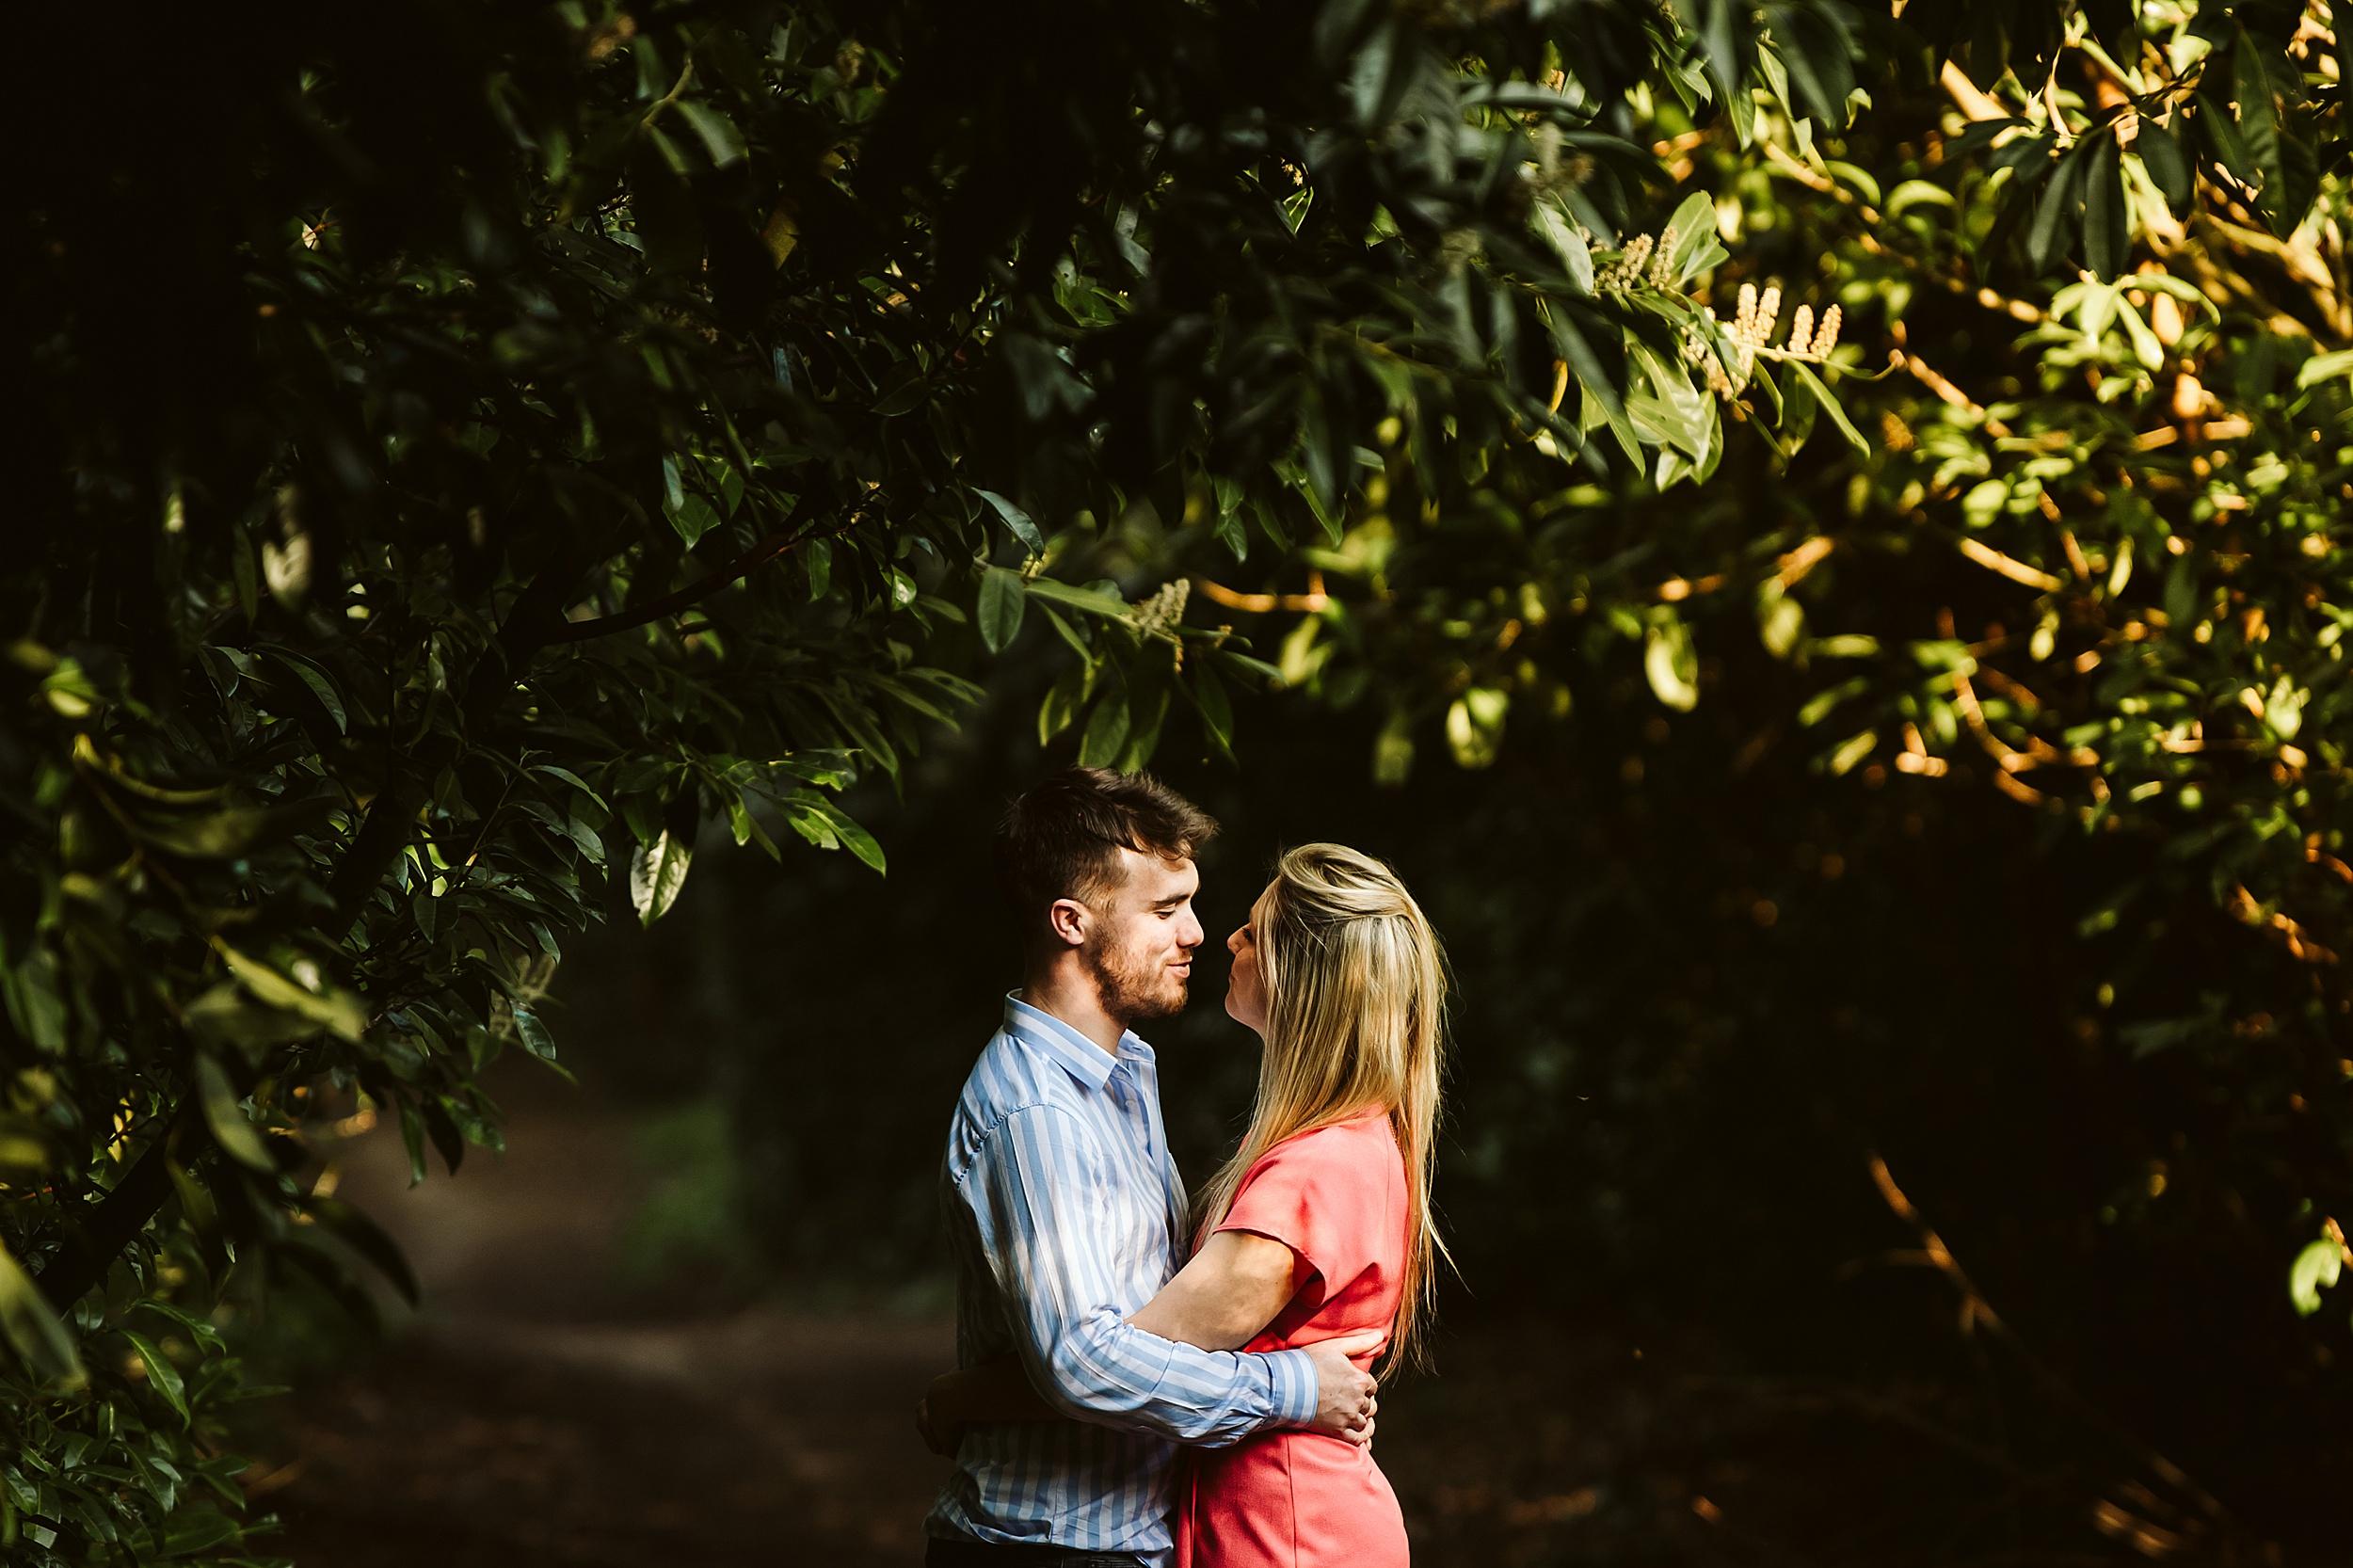 Toronto_Wedding_Photographer_UK_Destination_Engagement_Shoot_0017.jpg